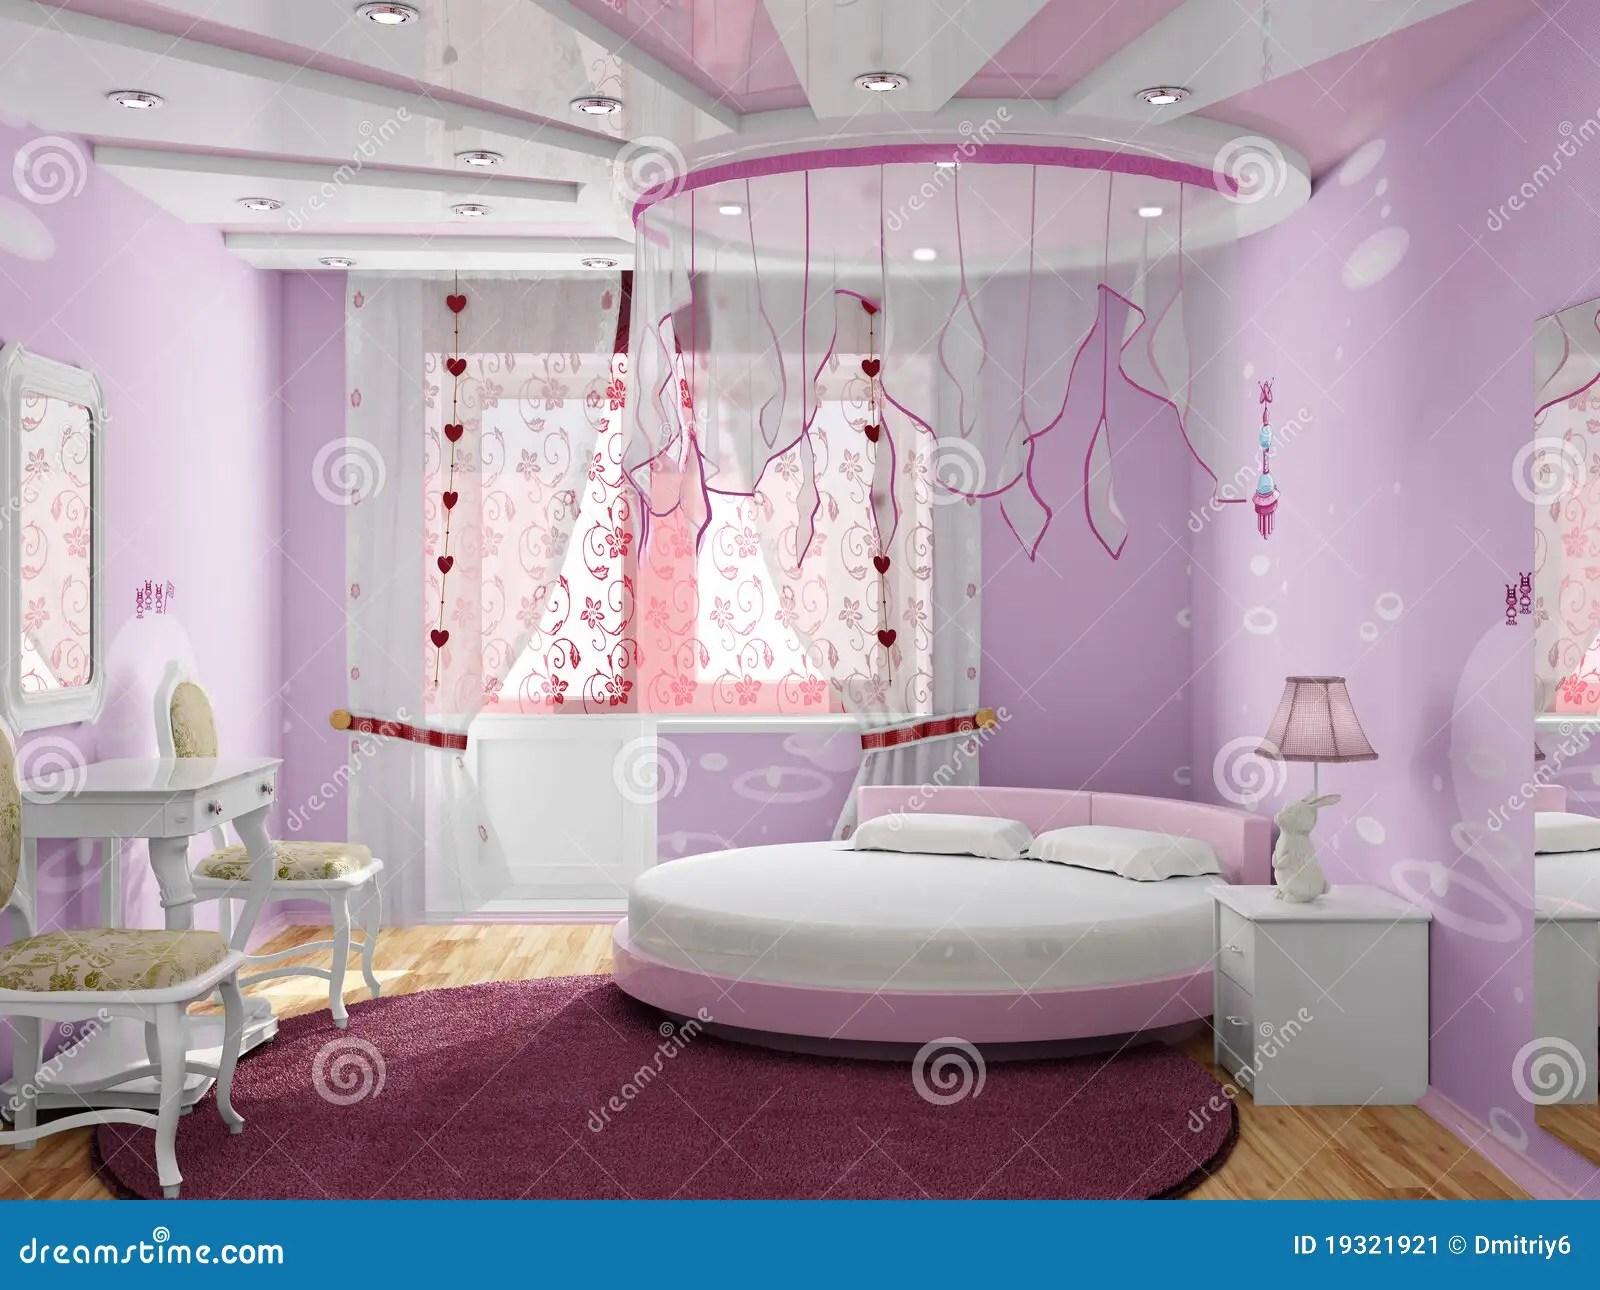 Lampadario camera da letto ragazza lihuideng lampadario camera